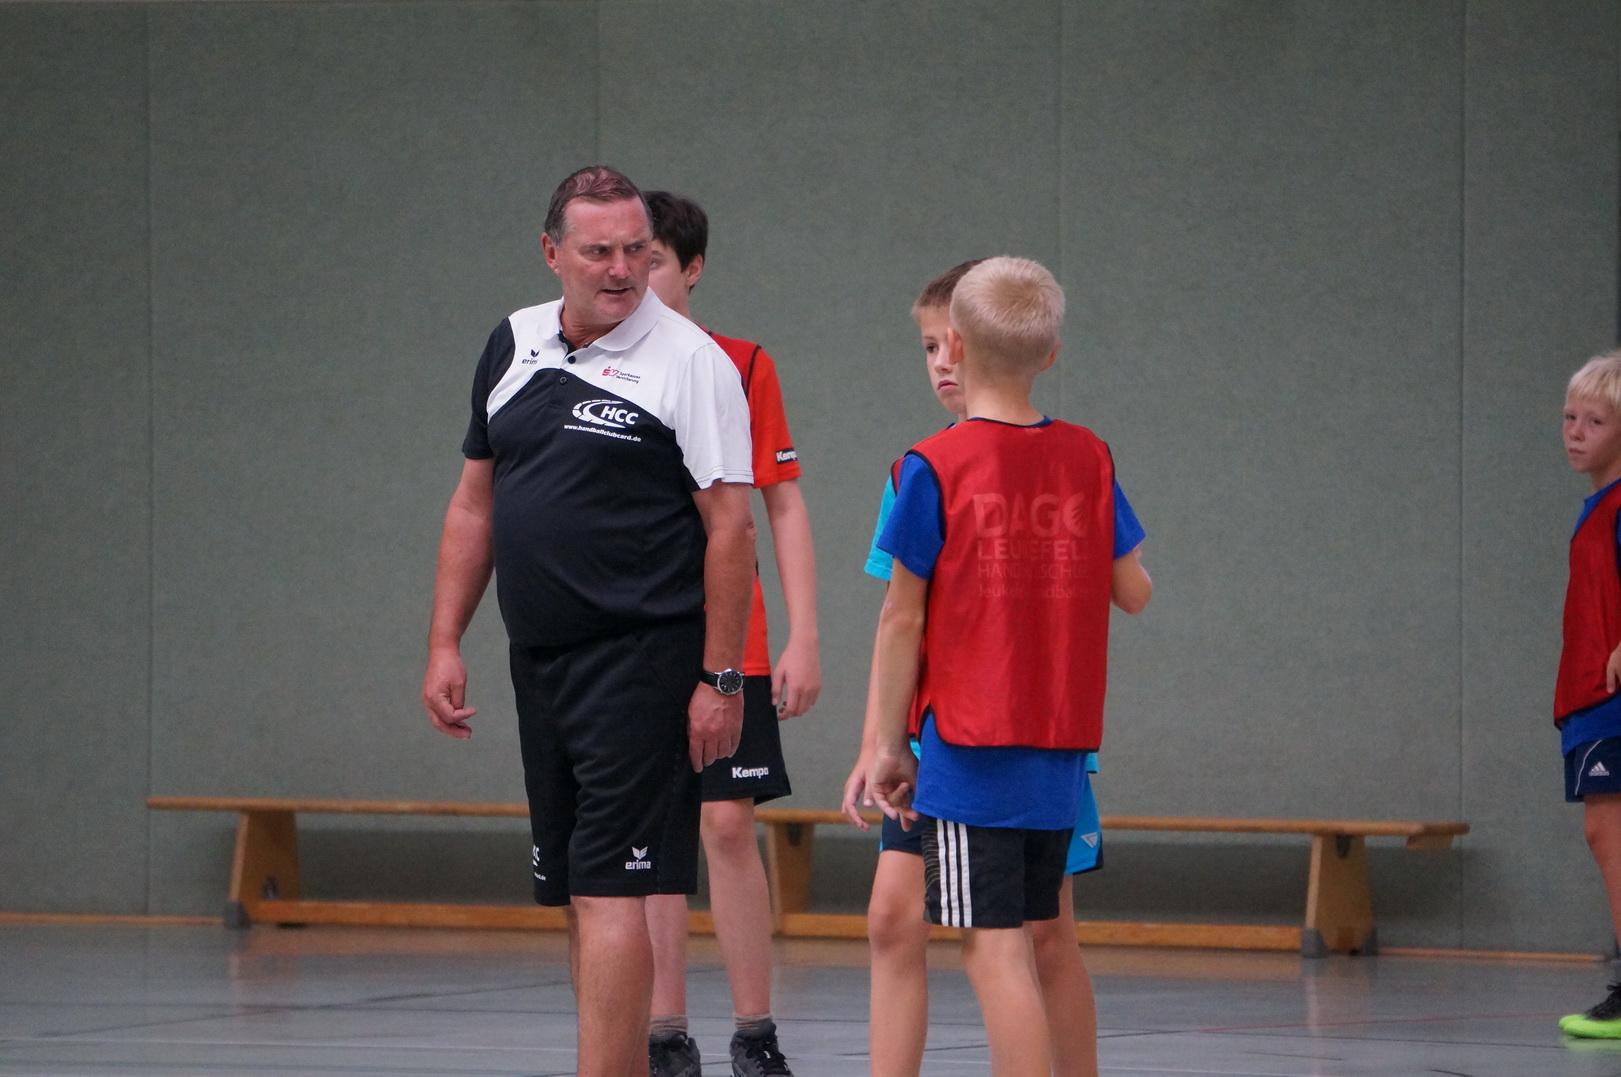 201808_Handballcamp_SDH_MG_268w